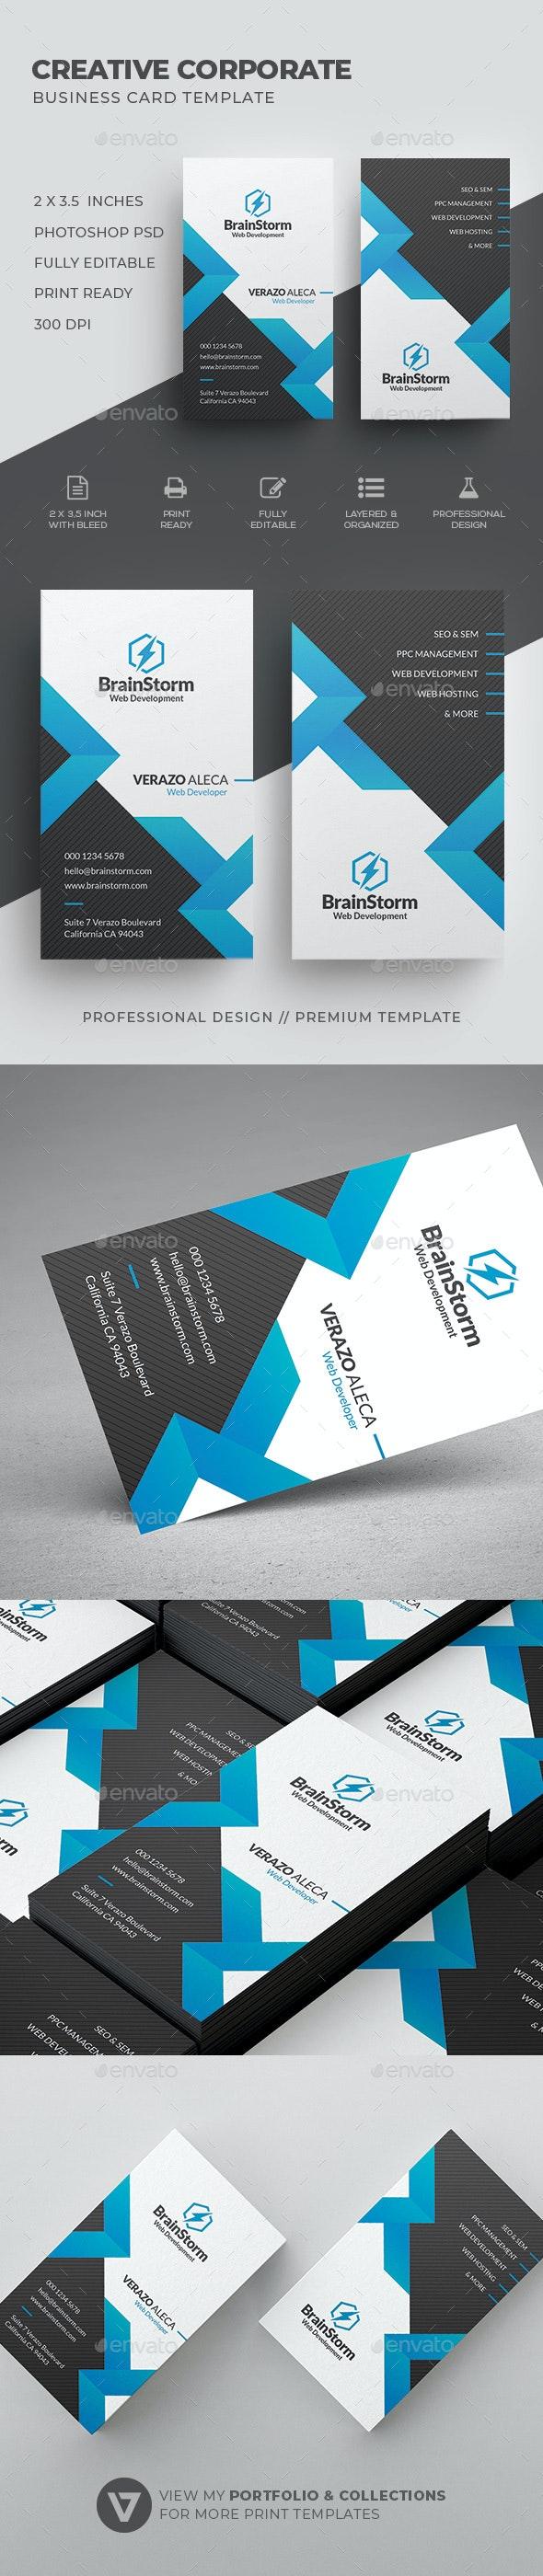 Creative Corporate Business Card Template - Corporate Business Cards